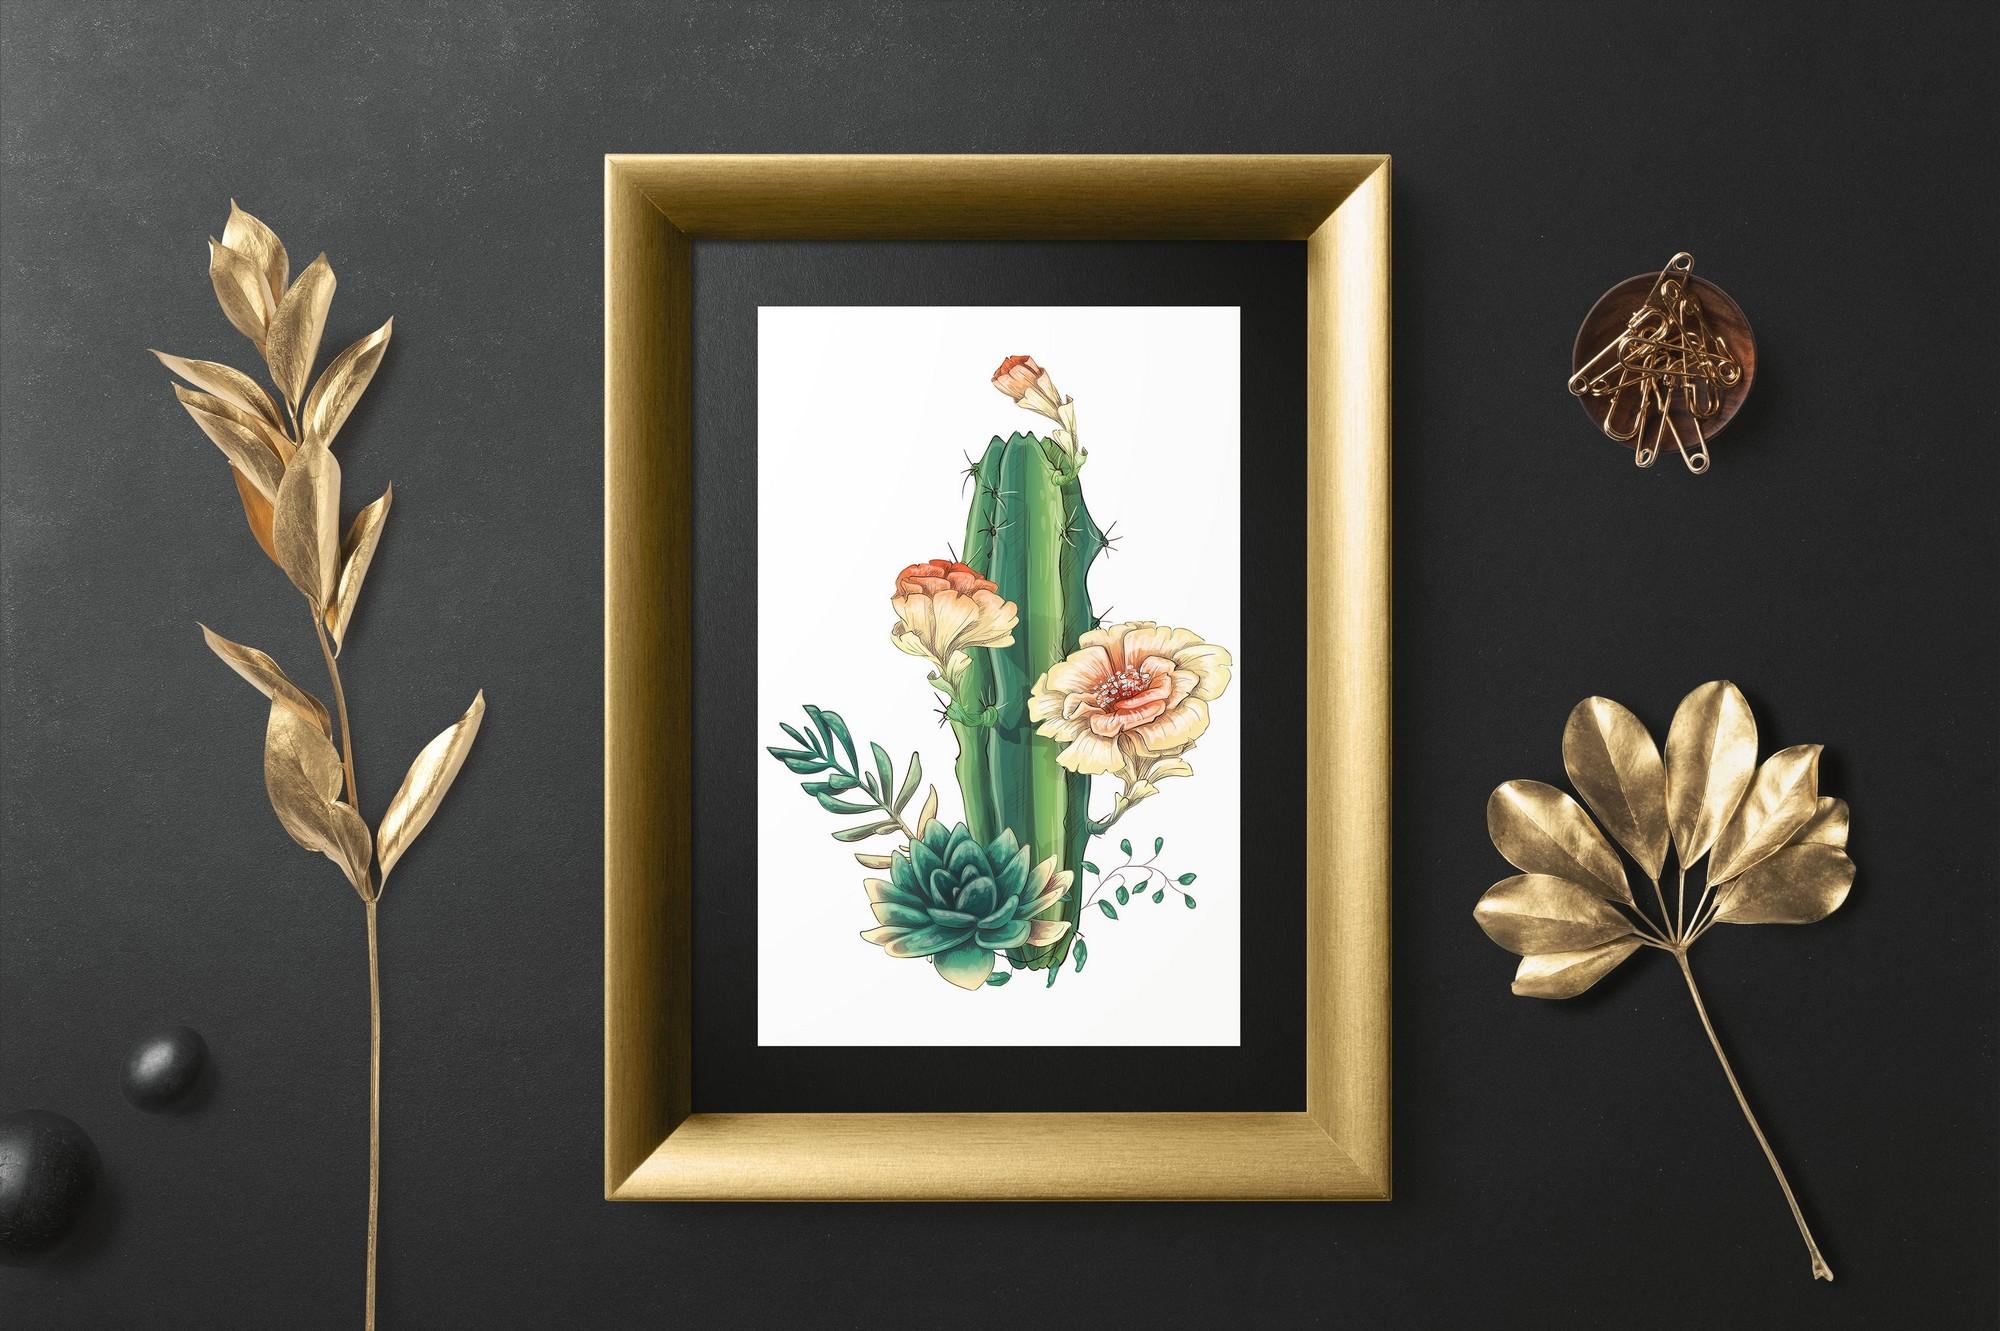 Cute Cactus Clipart: Cacti & Succulents Vectors - Image00009 1